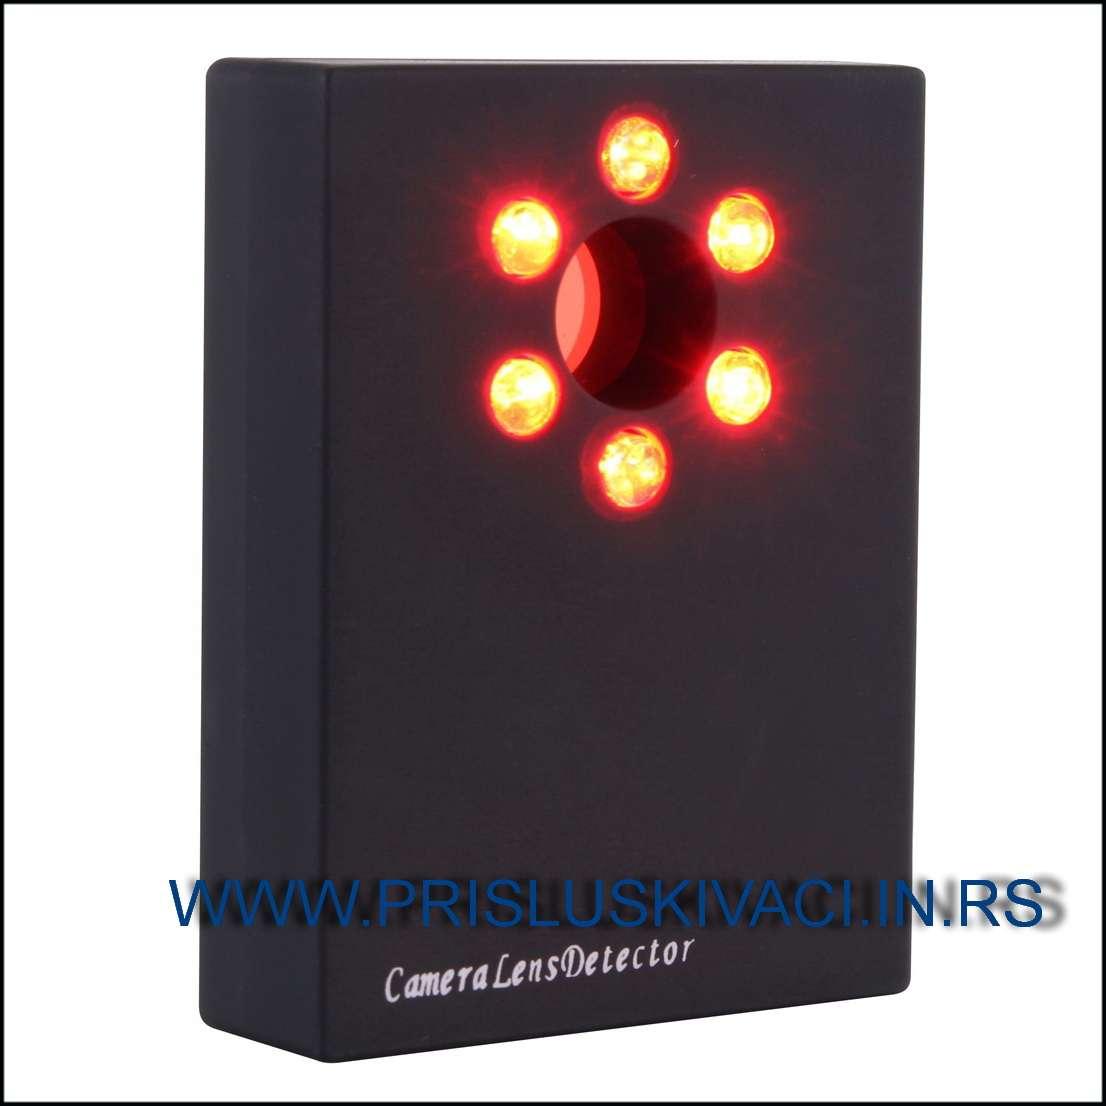 detektor kamera - detektori prisluskivaca